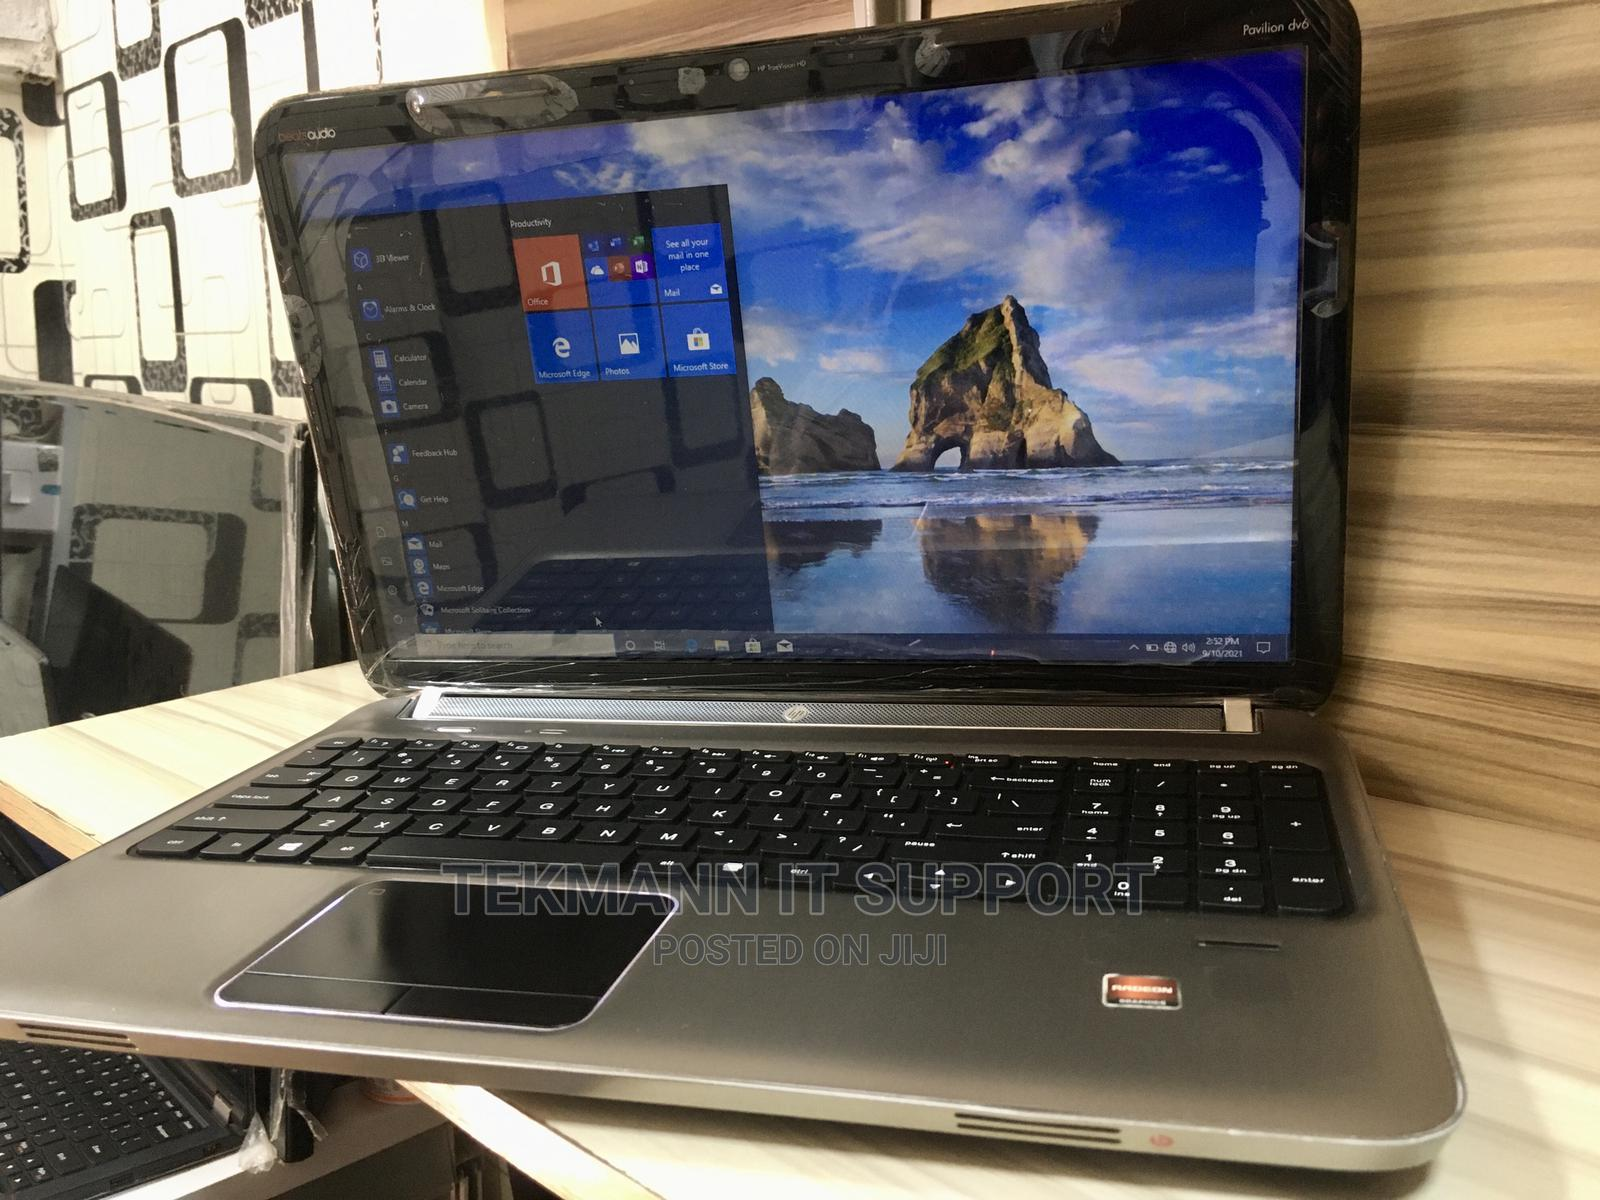 Laptop HP Pavilion Dv6 4GB Intel Core I3 HDD 640GB